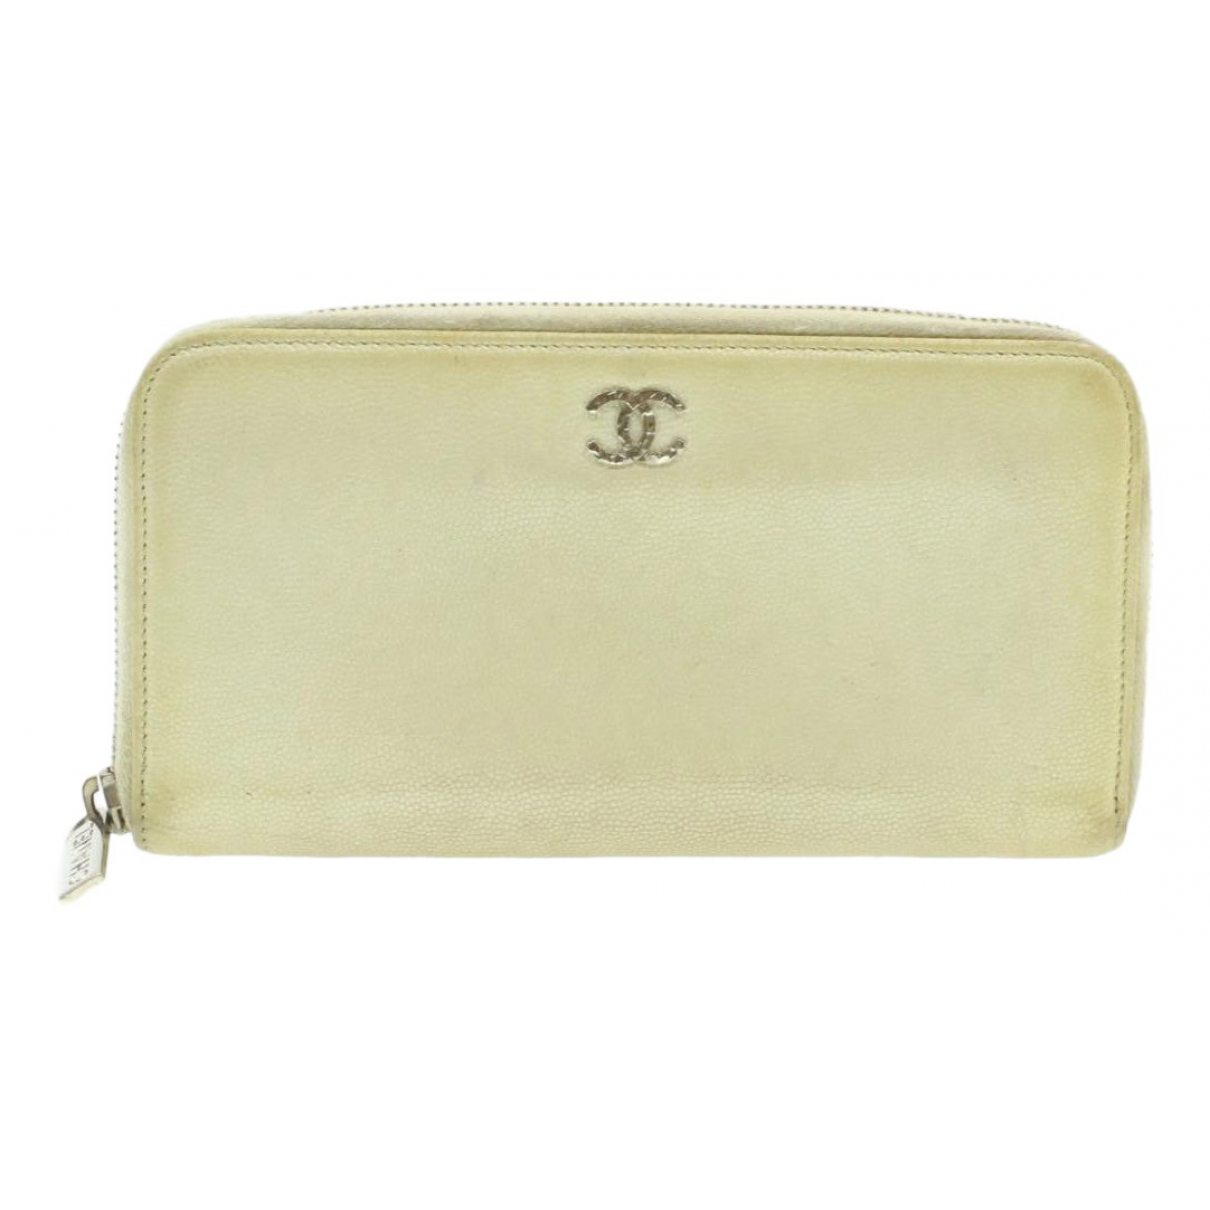 Chanel \N Portemonnaie in  Weiss Leder